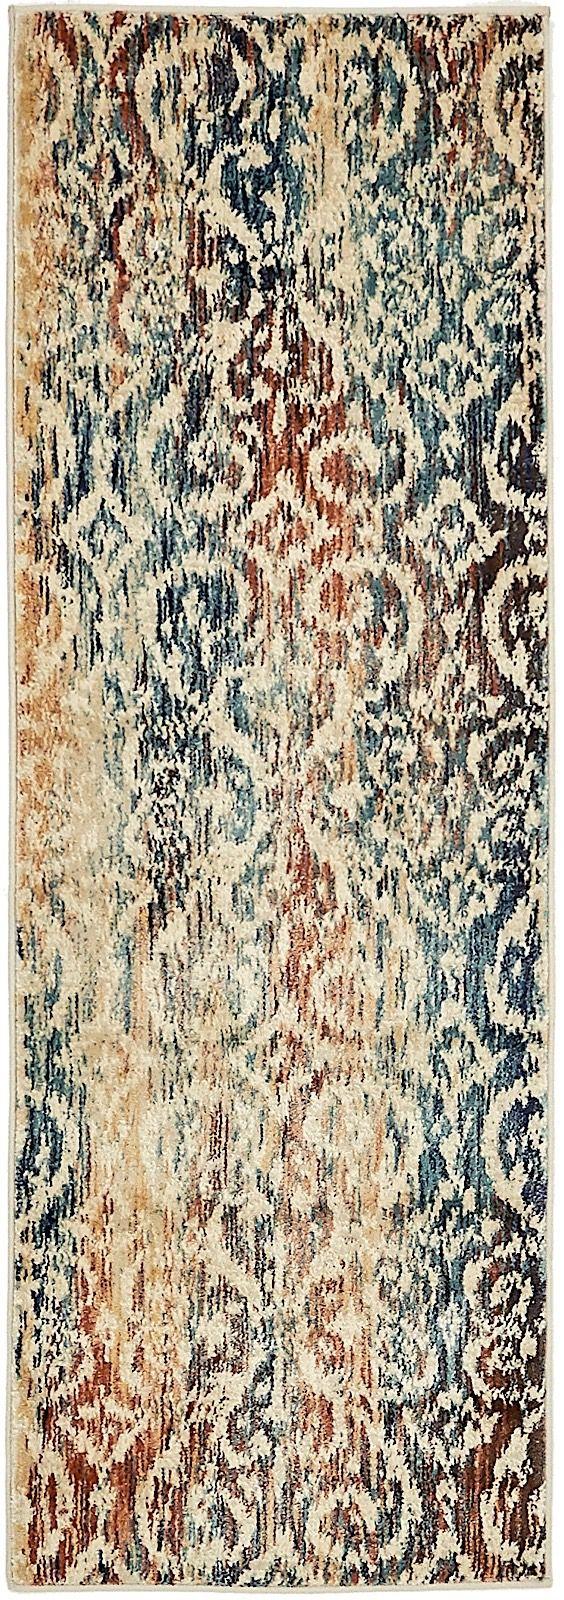 rugpal spiritual transitional area rug collection